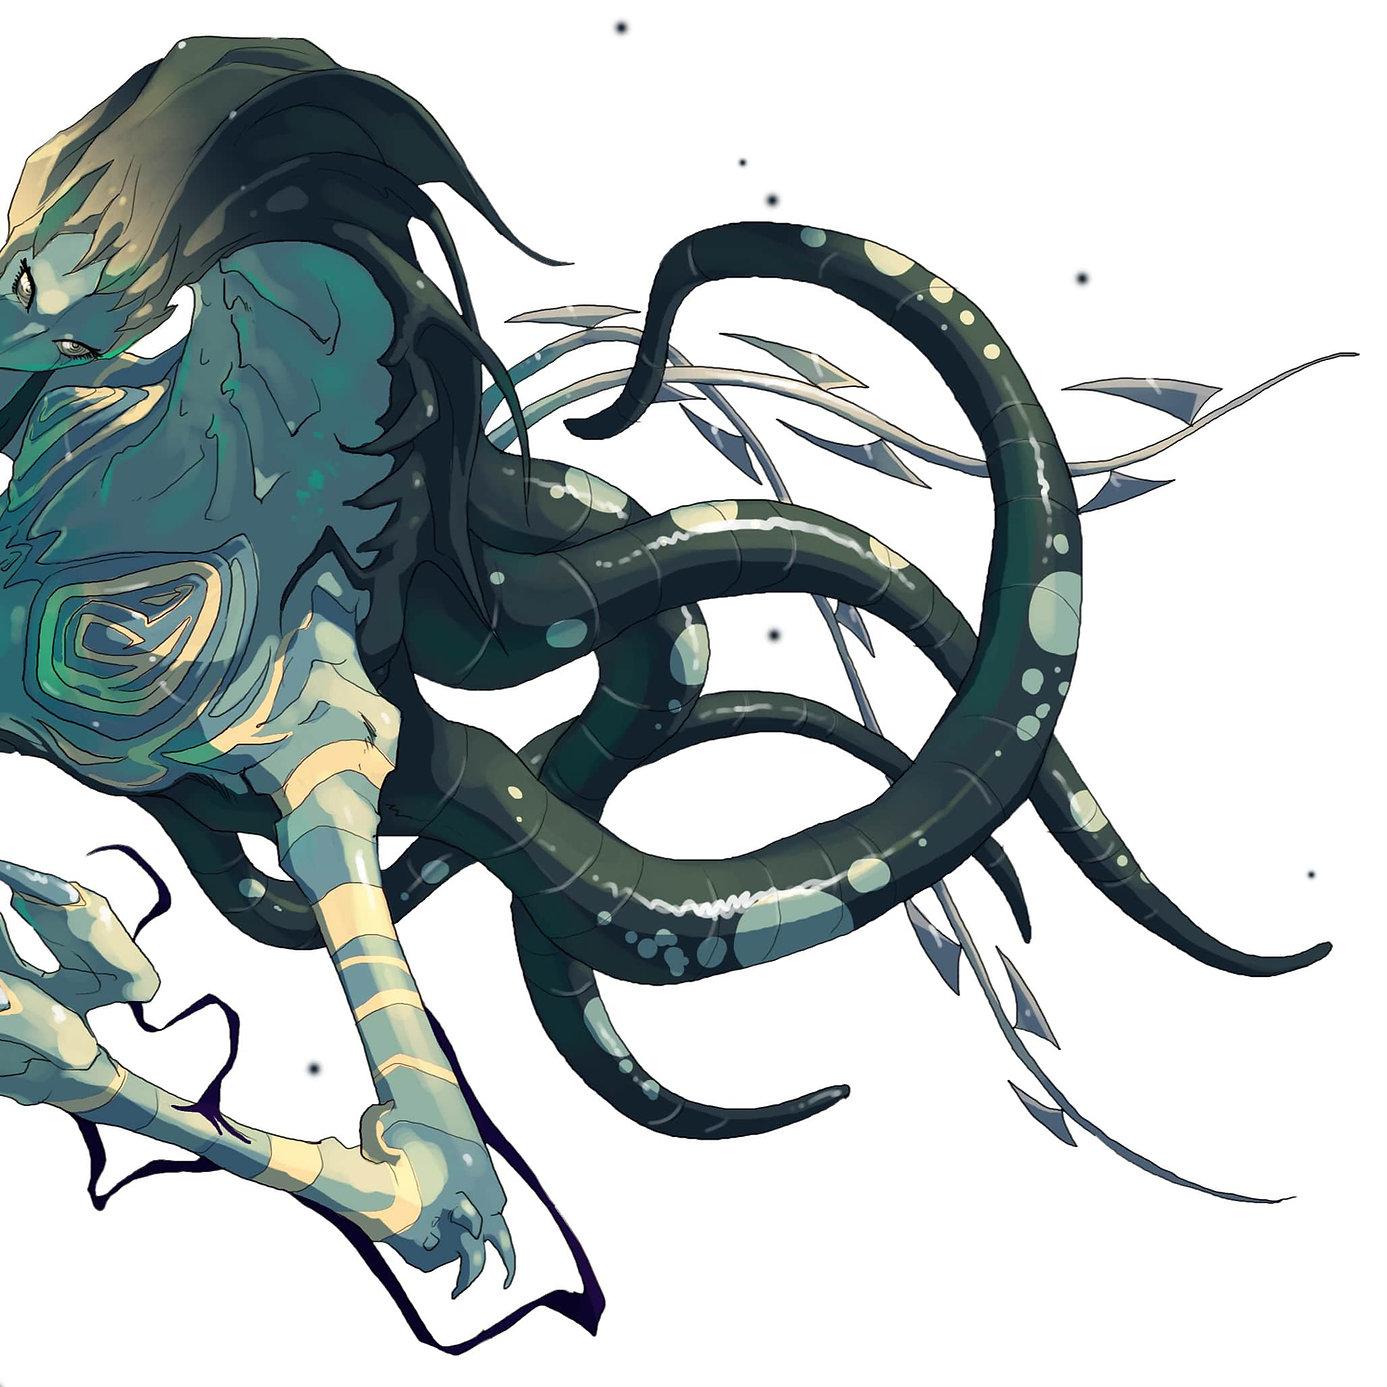 Monstre tentacules horreur cauchemar res